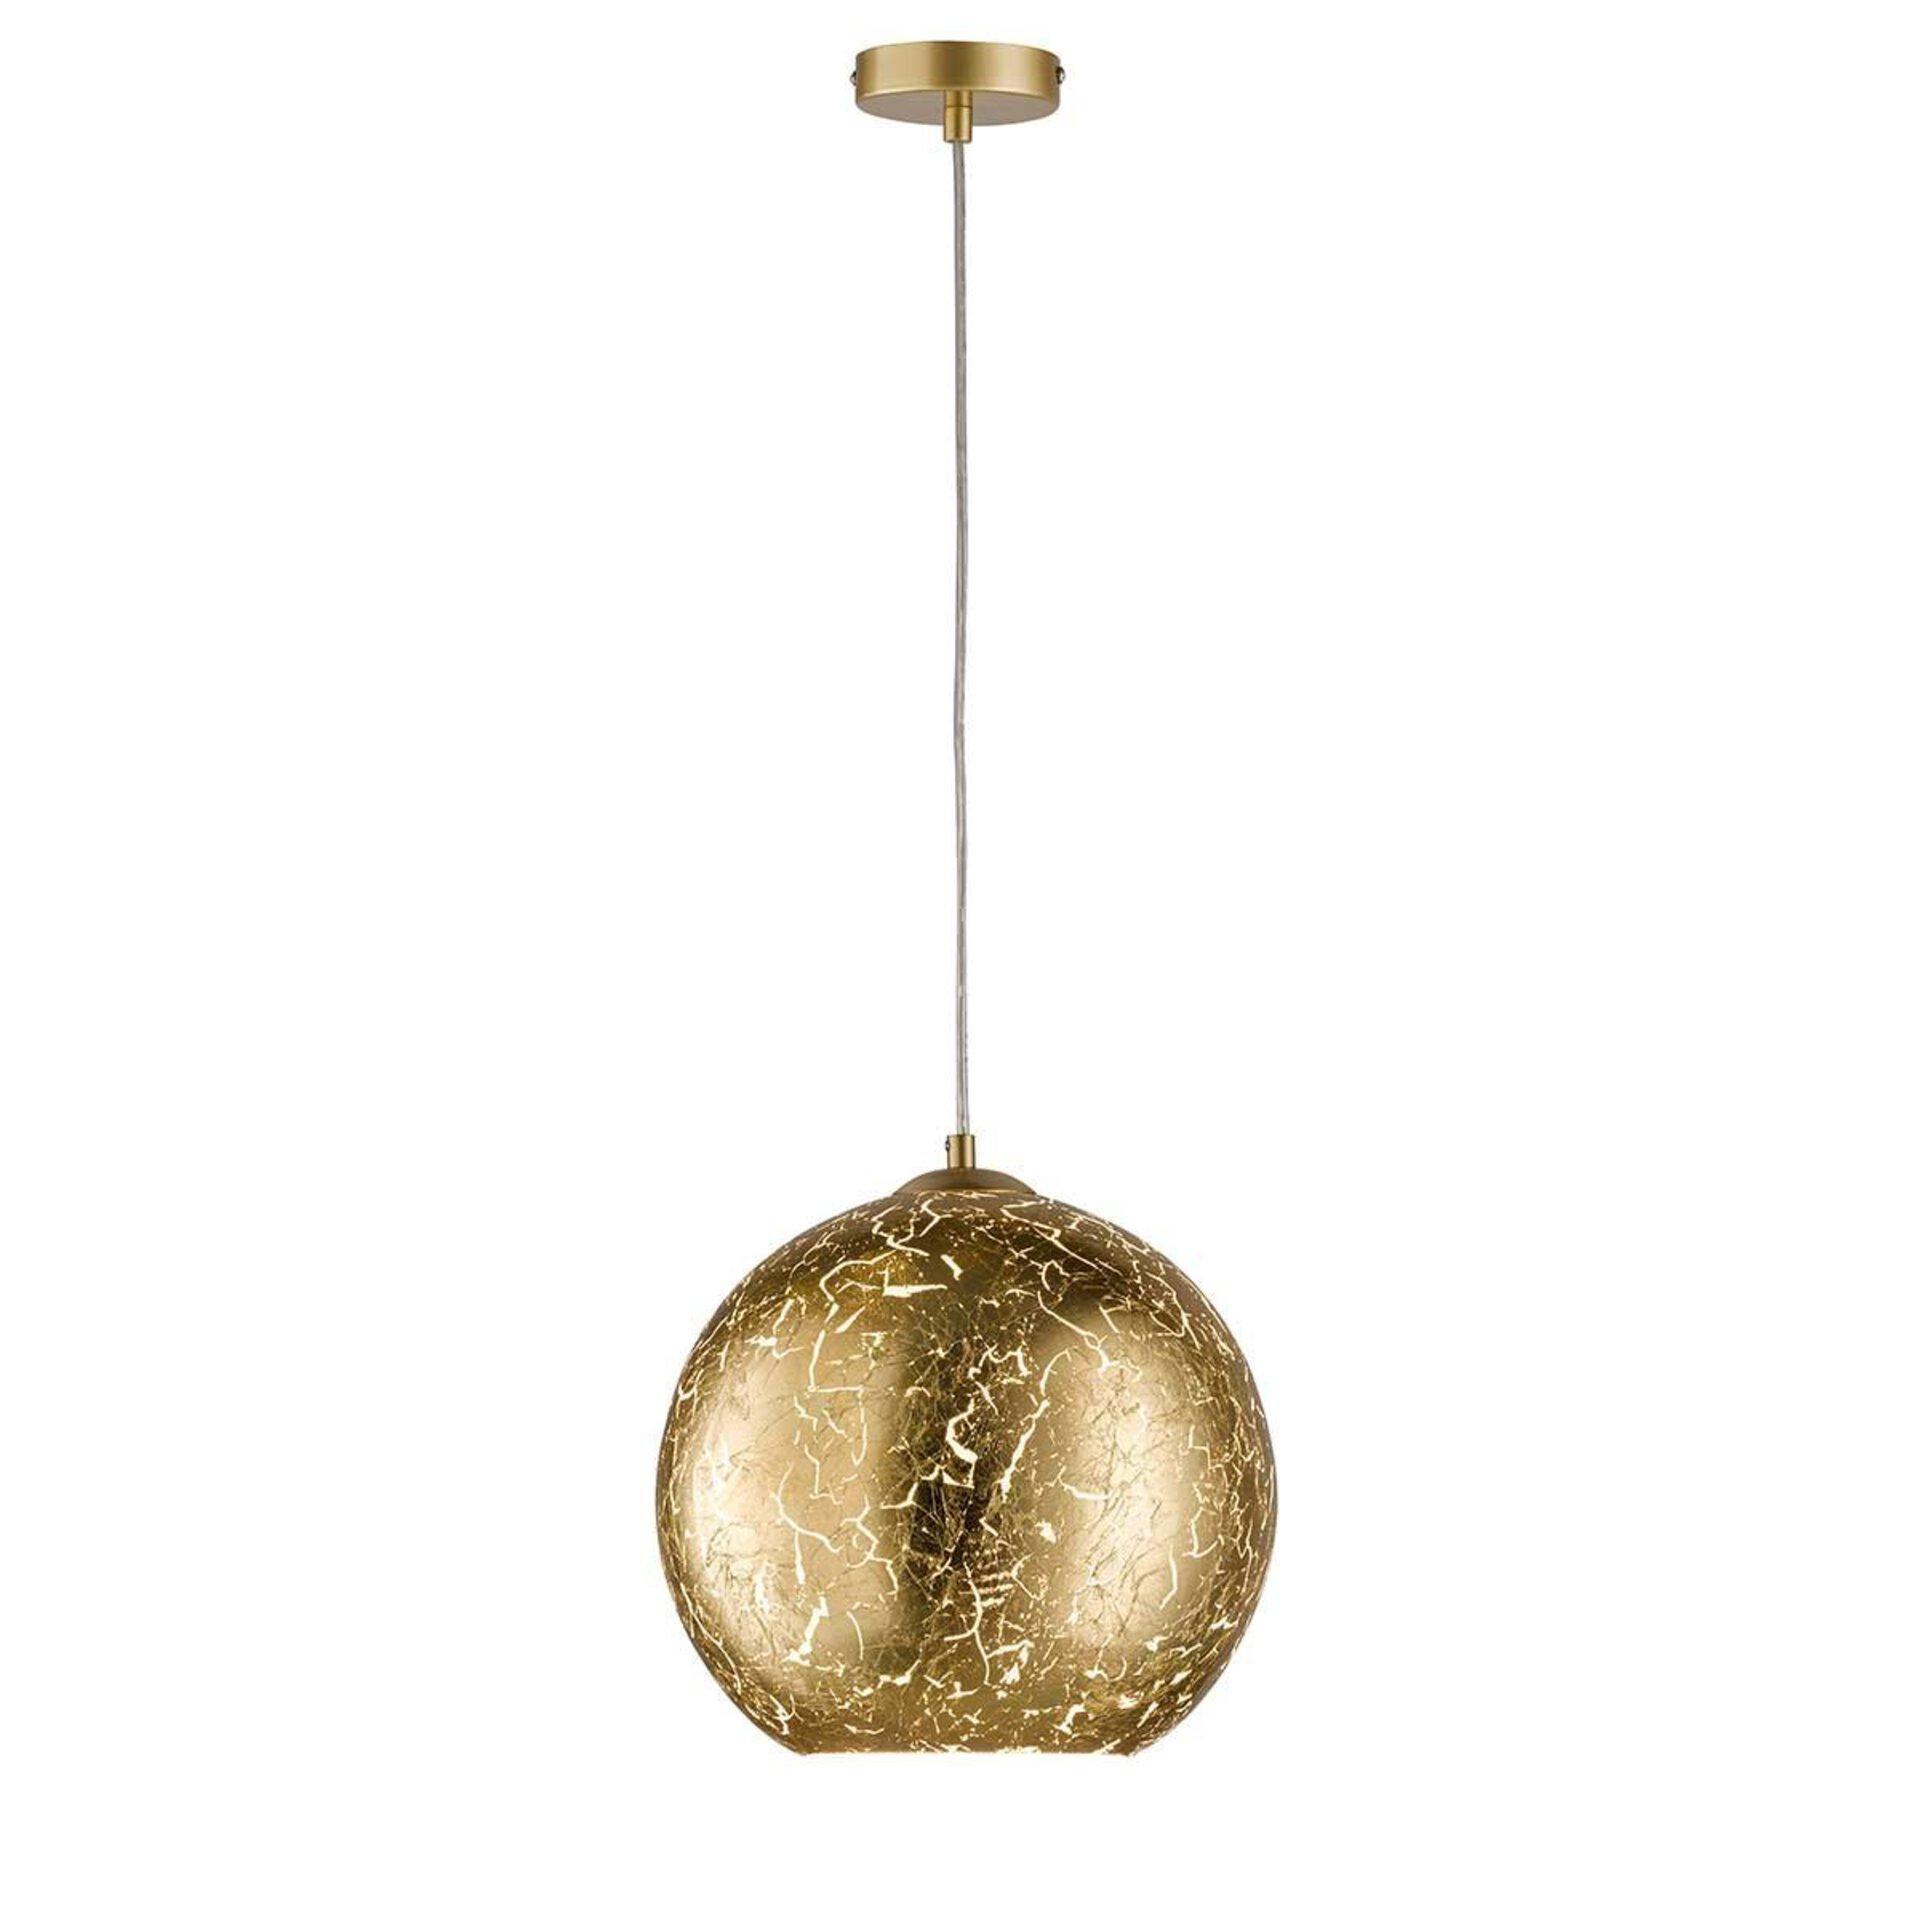 Hängeleuchte Fara Wofi Leuchten Metall gold 30 x 150 x 30 cm